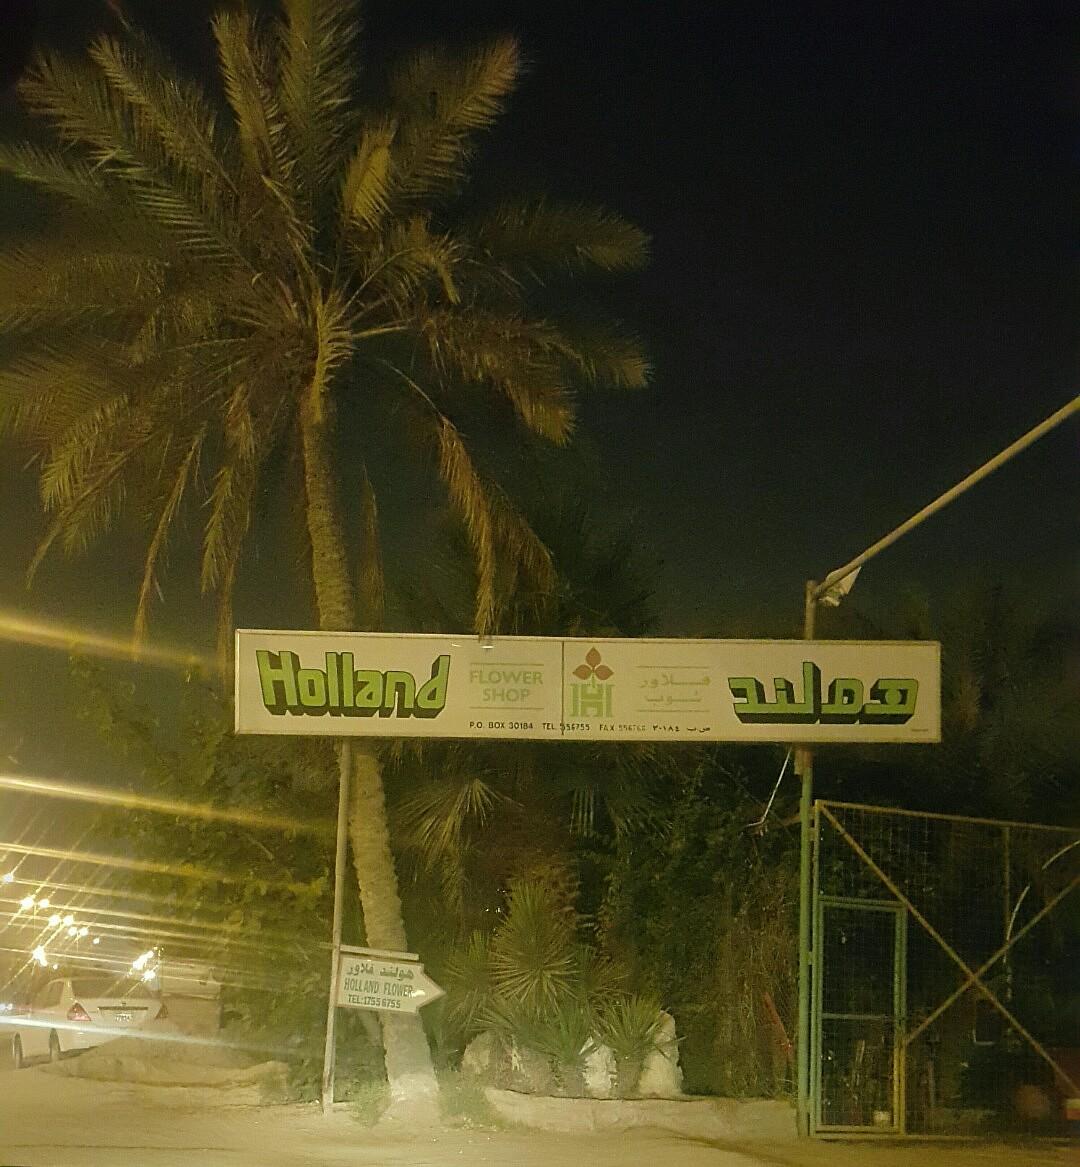 #flower @ Holland Flower Shop - Bahrain